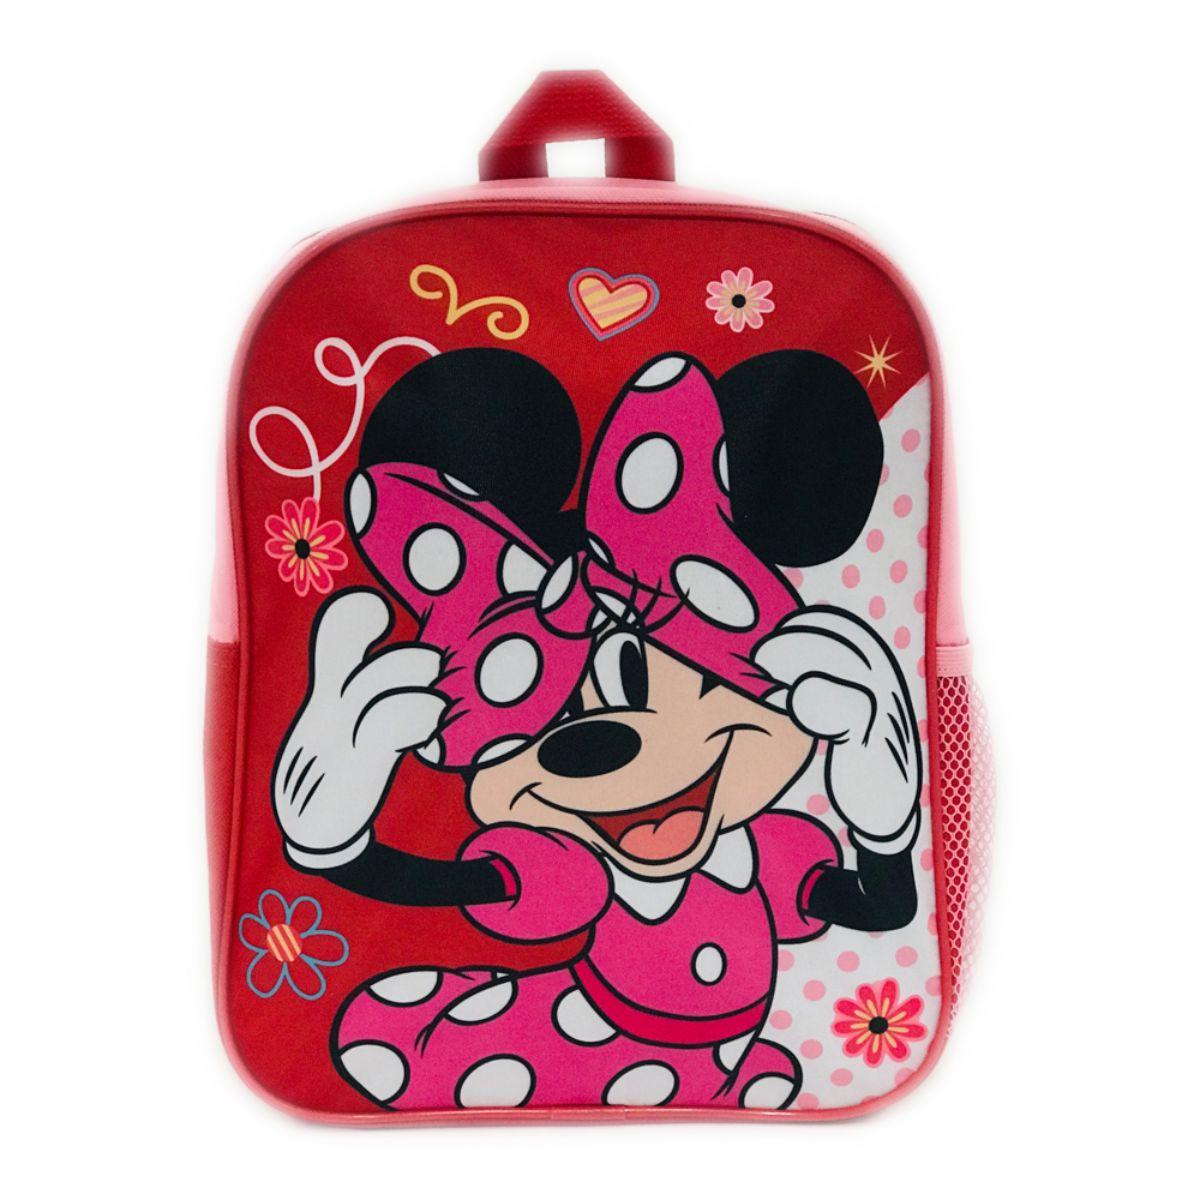 Ghiozdan mini Minnie Mouse, rosu